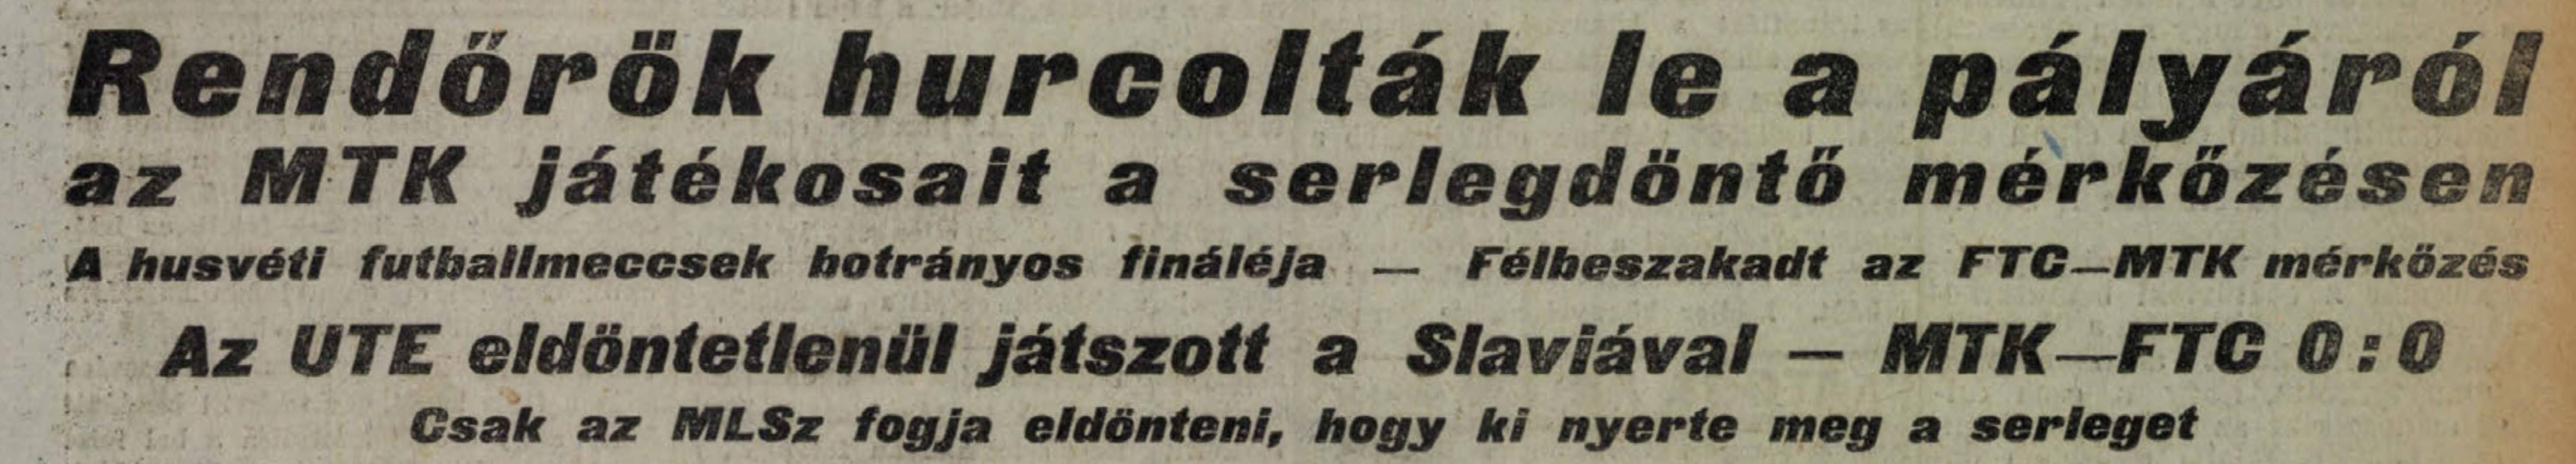 sporthirlap2_1926_04_pages22-22.jpg